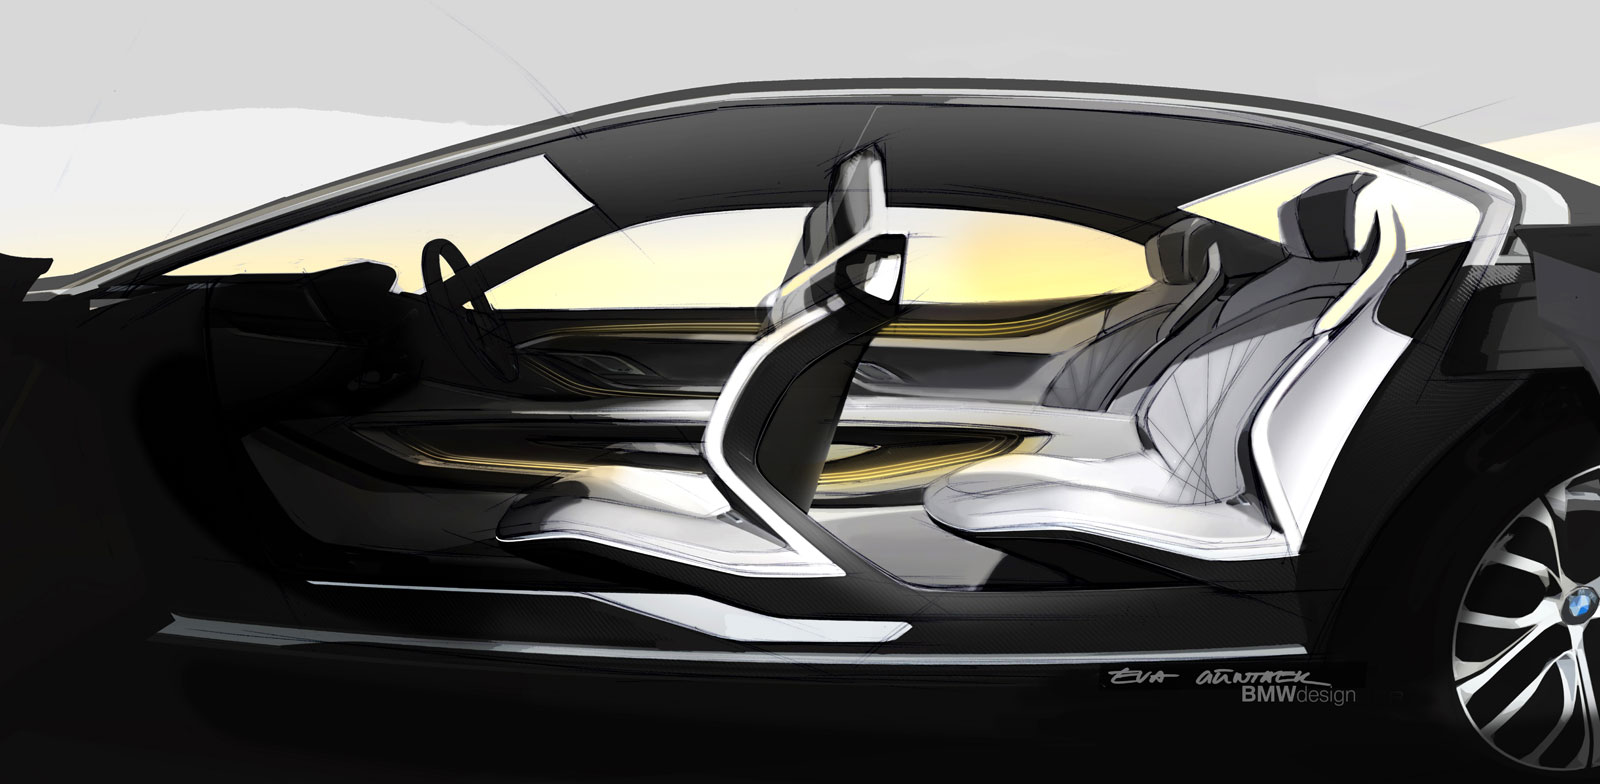 bmw vision future luxury concept interior design sketch car body design. Black Bedroom Furniture Sets. Home Design Ideas